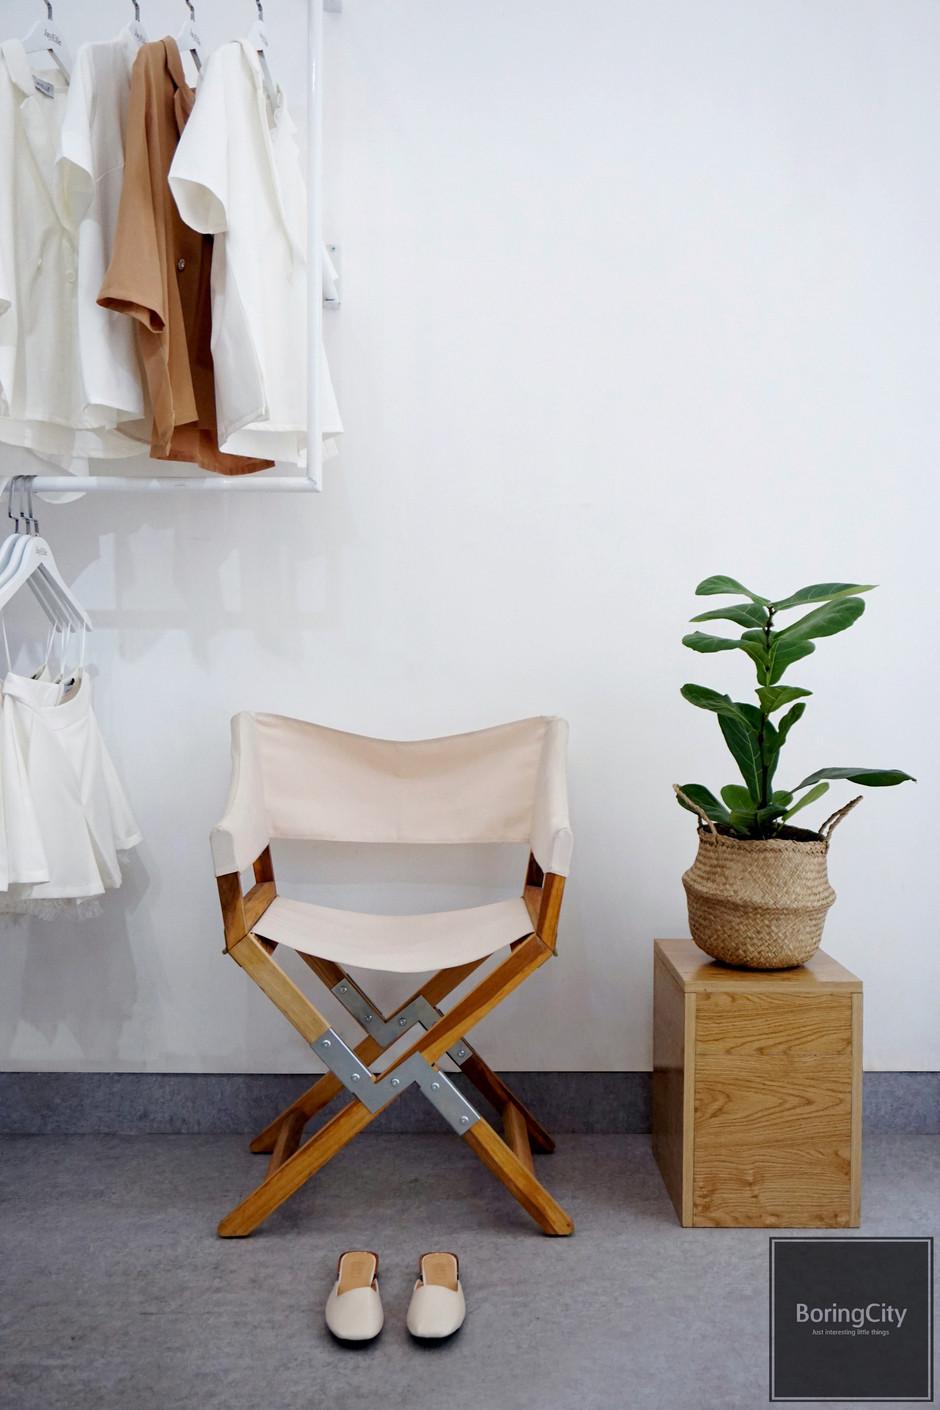 JayElle Cloth Store